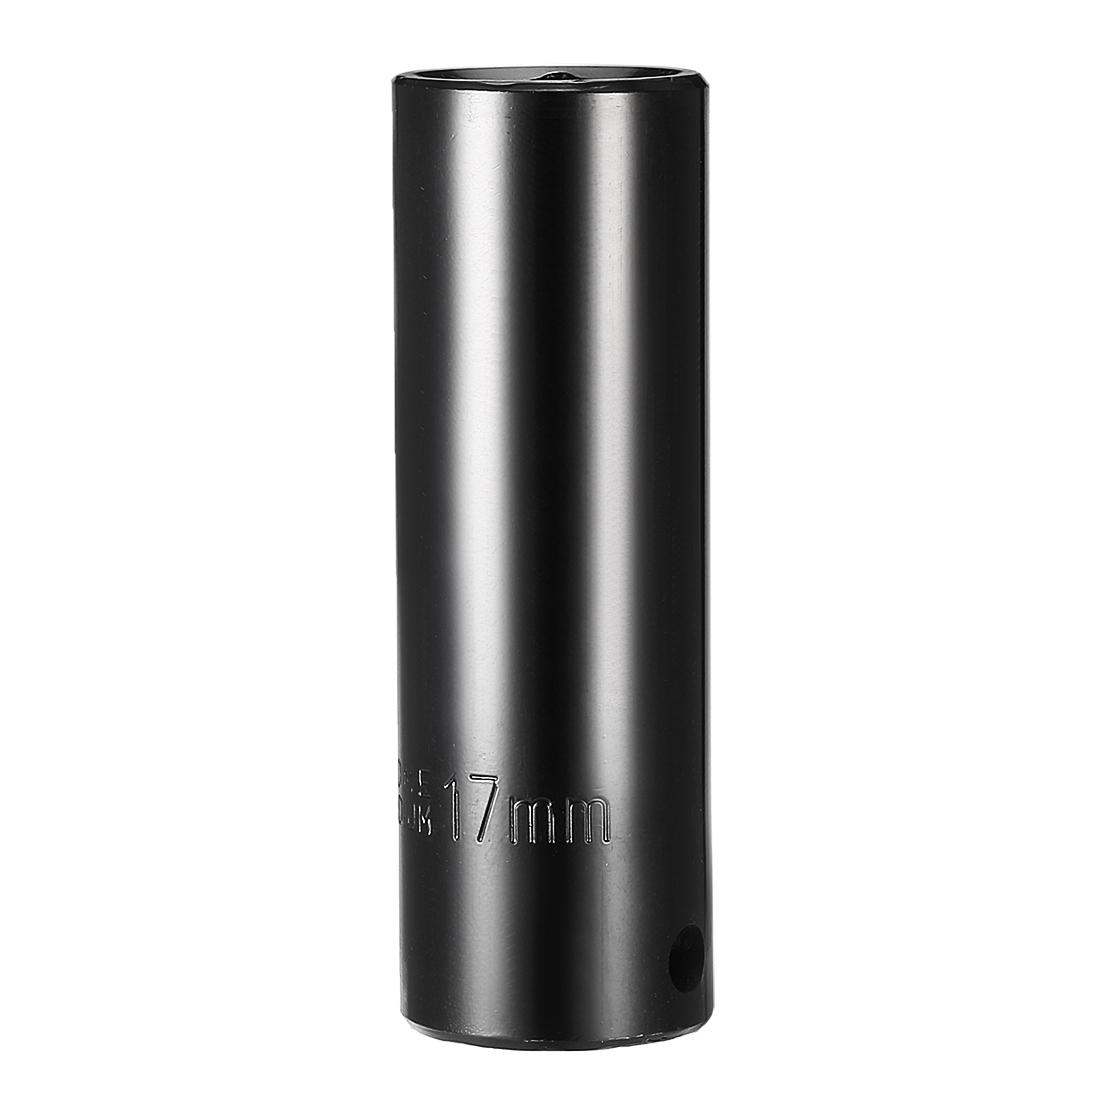 1/2-inch Drive 17mm 6-Point Deep Impact Socket, Cr-V Steel